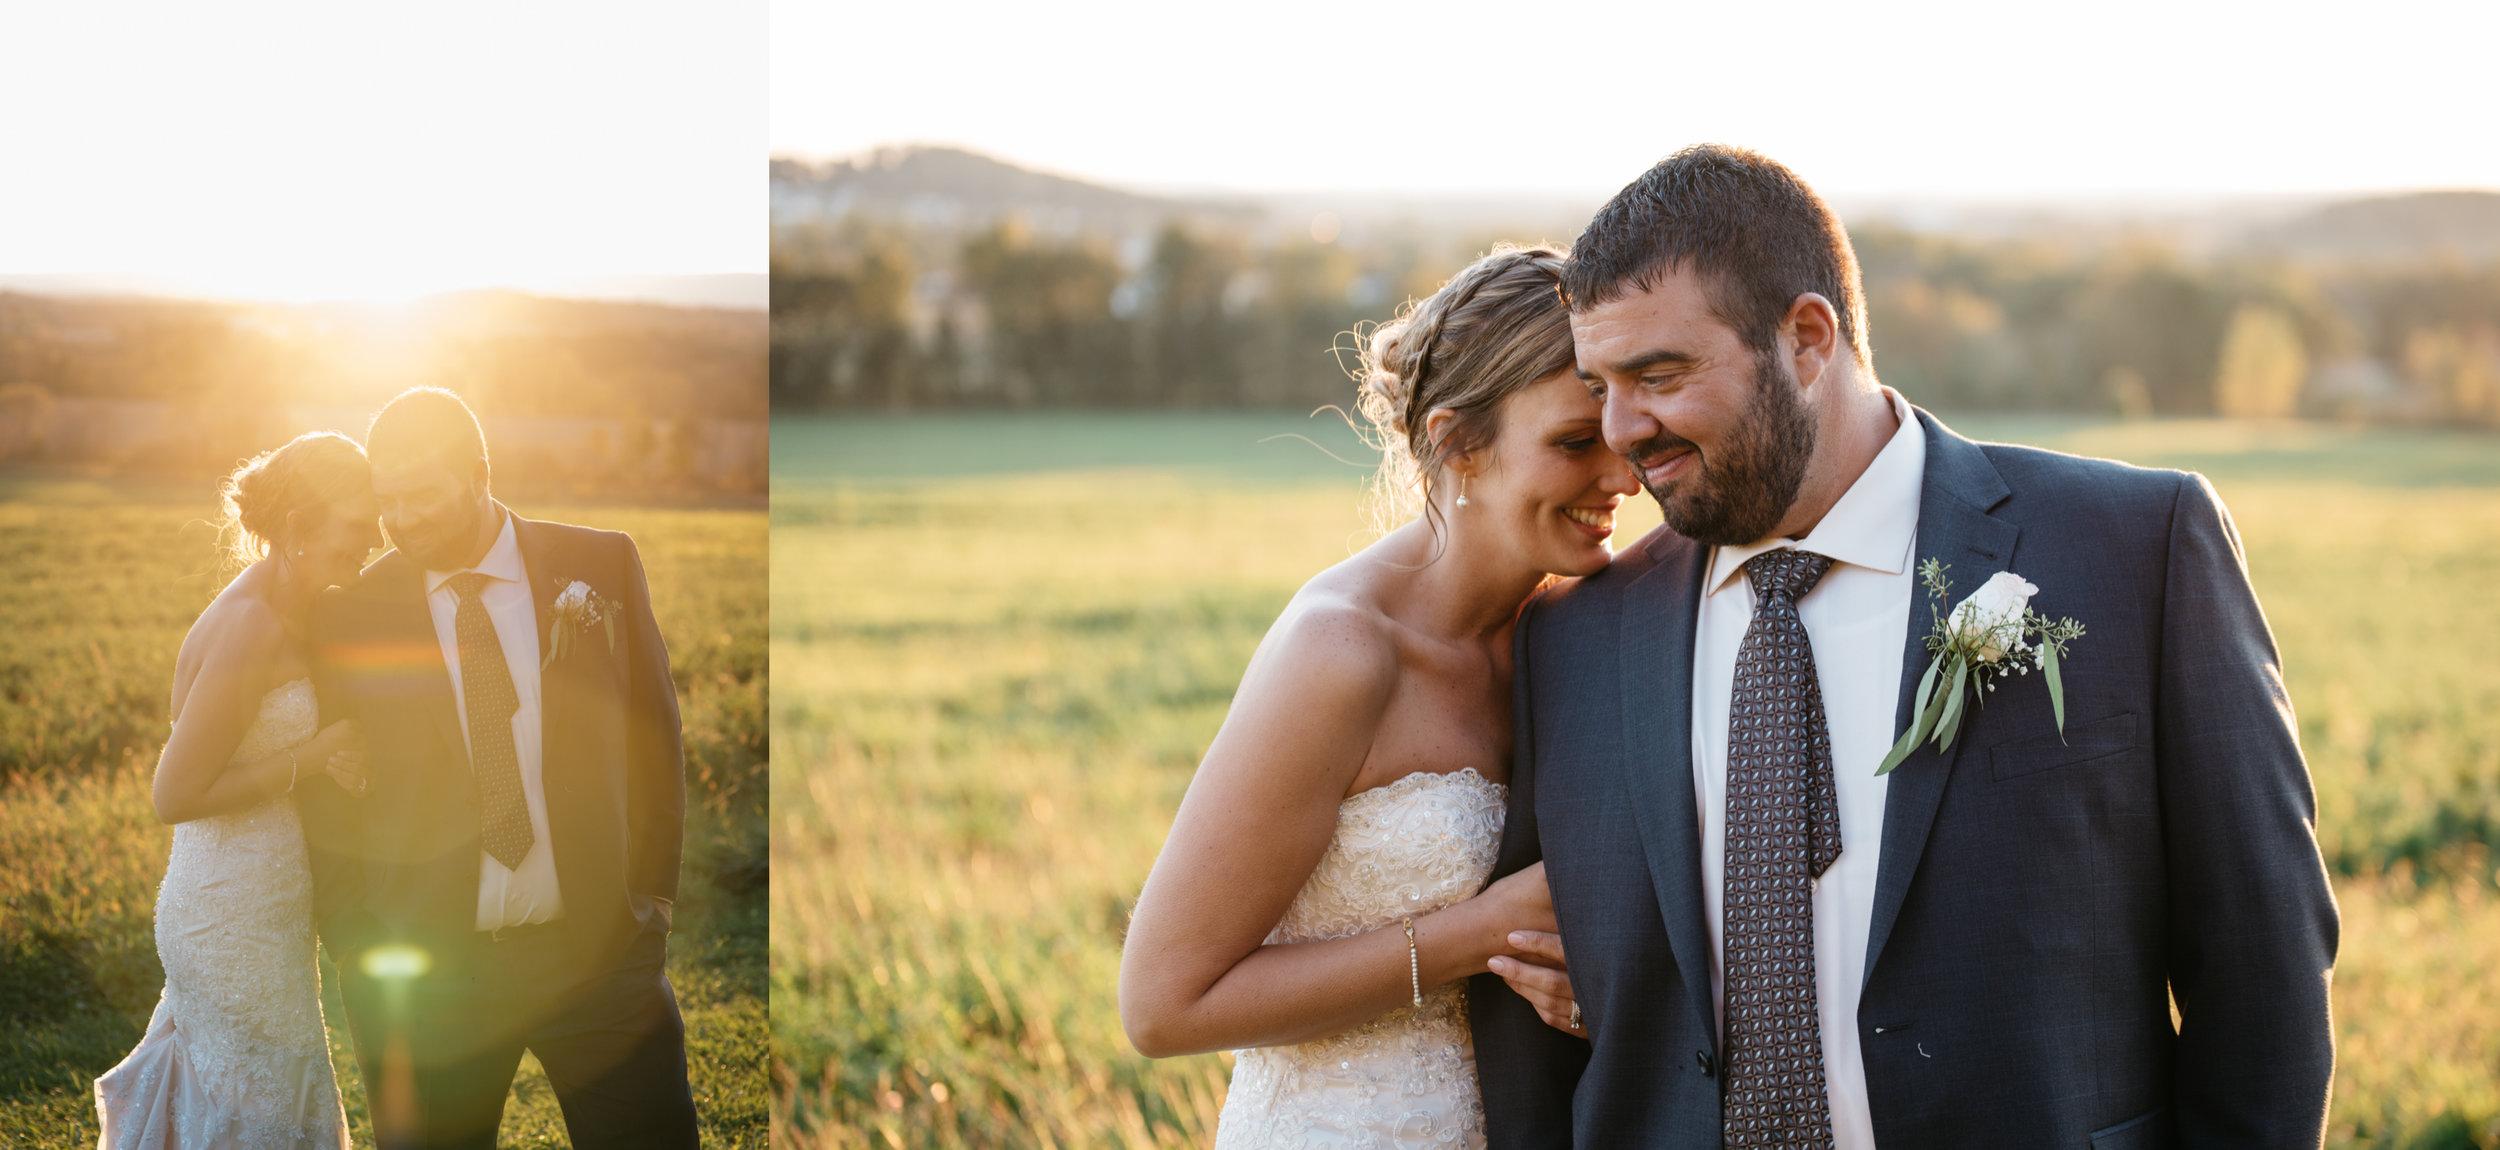 the-event-barn-at-highland-farm-pittsburgh-wedding-photographer.jpg